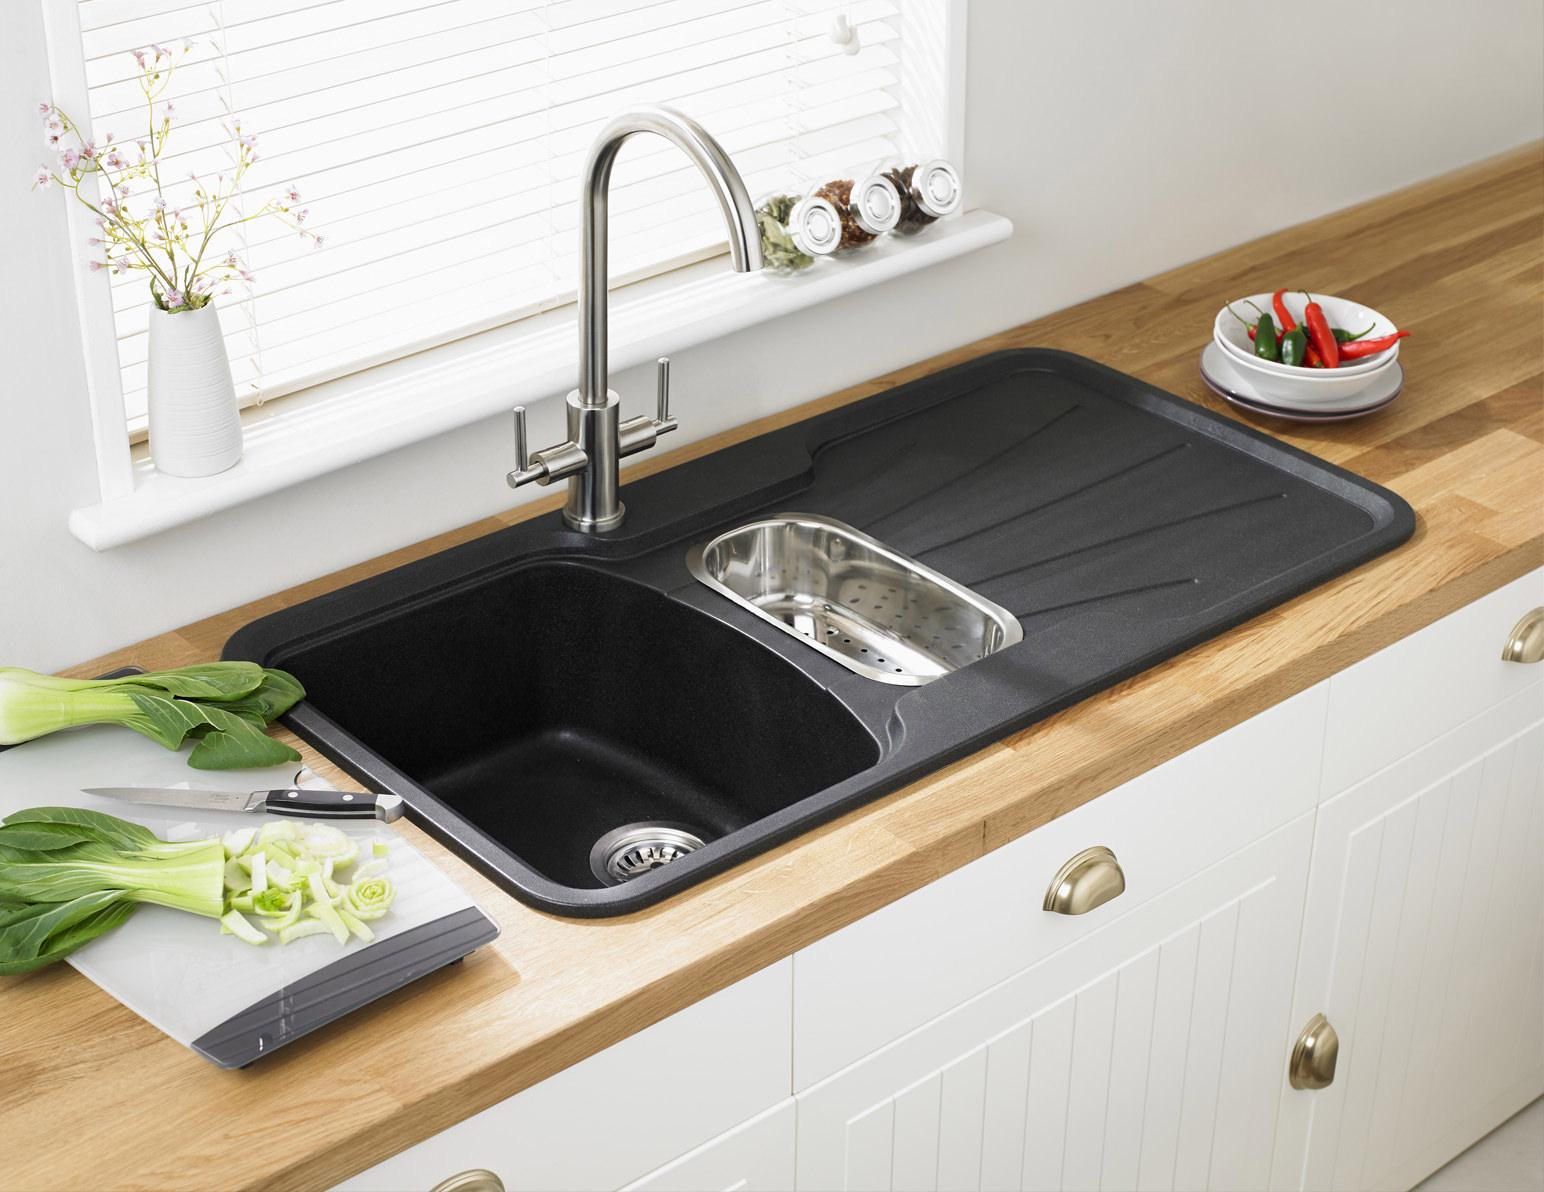 astracast korona 1 5b composite rok metallic inset sink. Black Bedroom Furniture Sets. Home Design Ideas